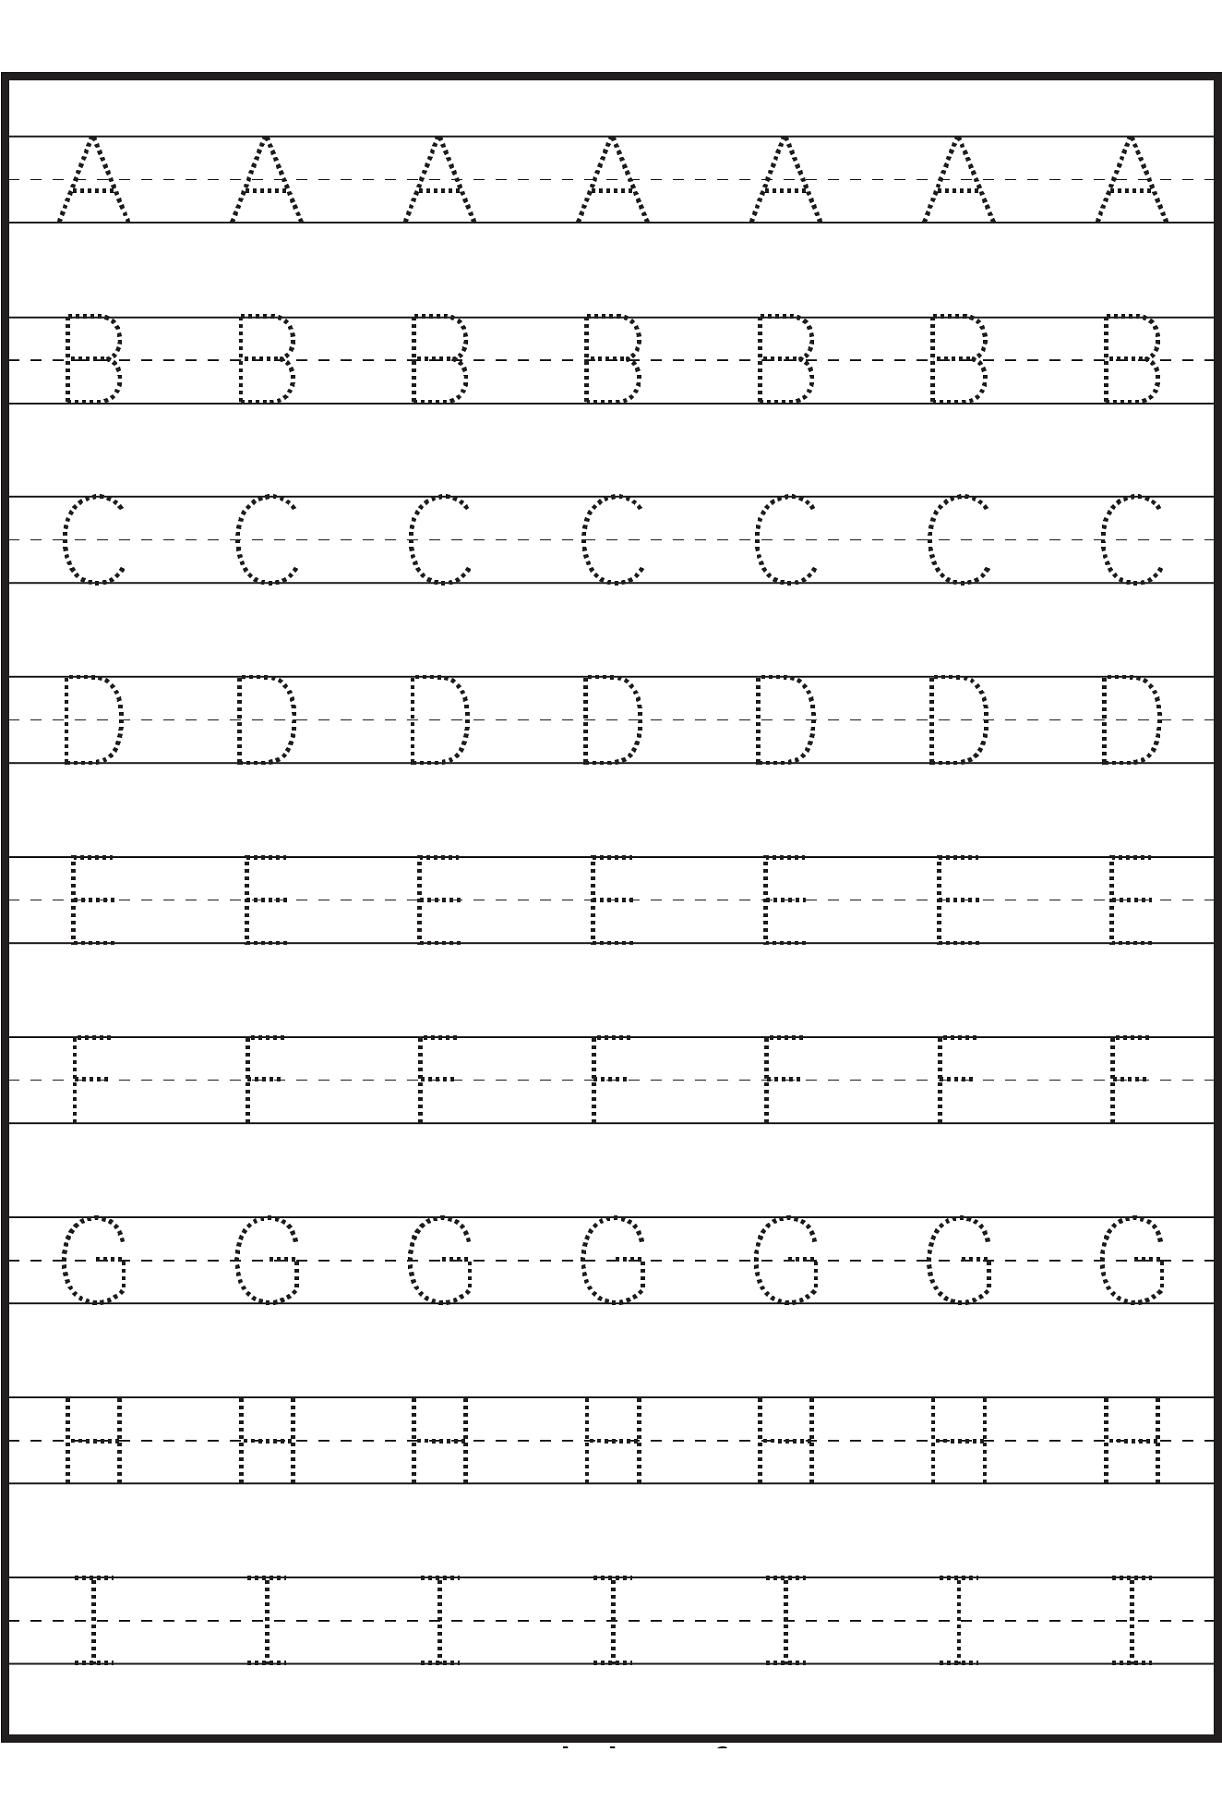 Incredible Letter Tracingrksheets Image Ideas